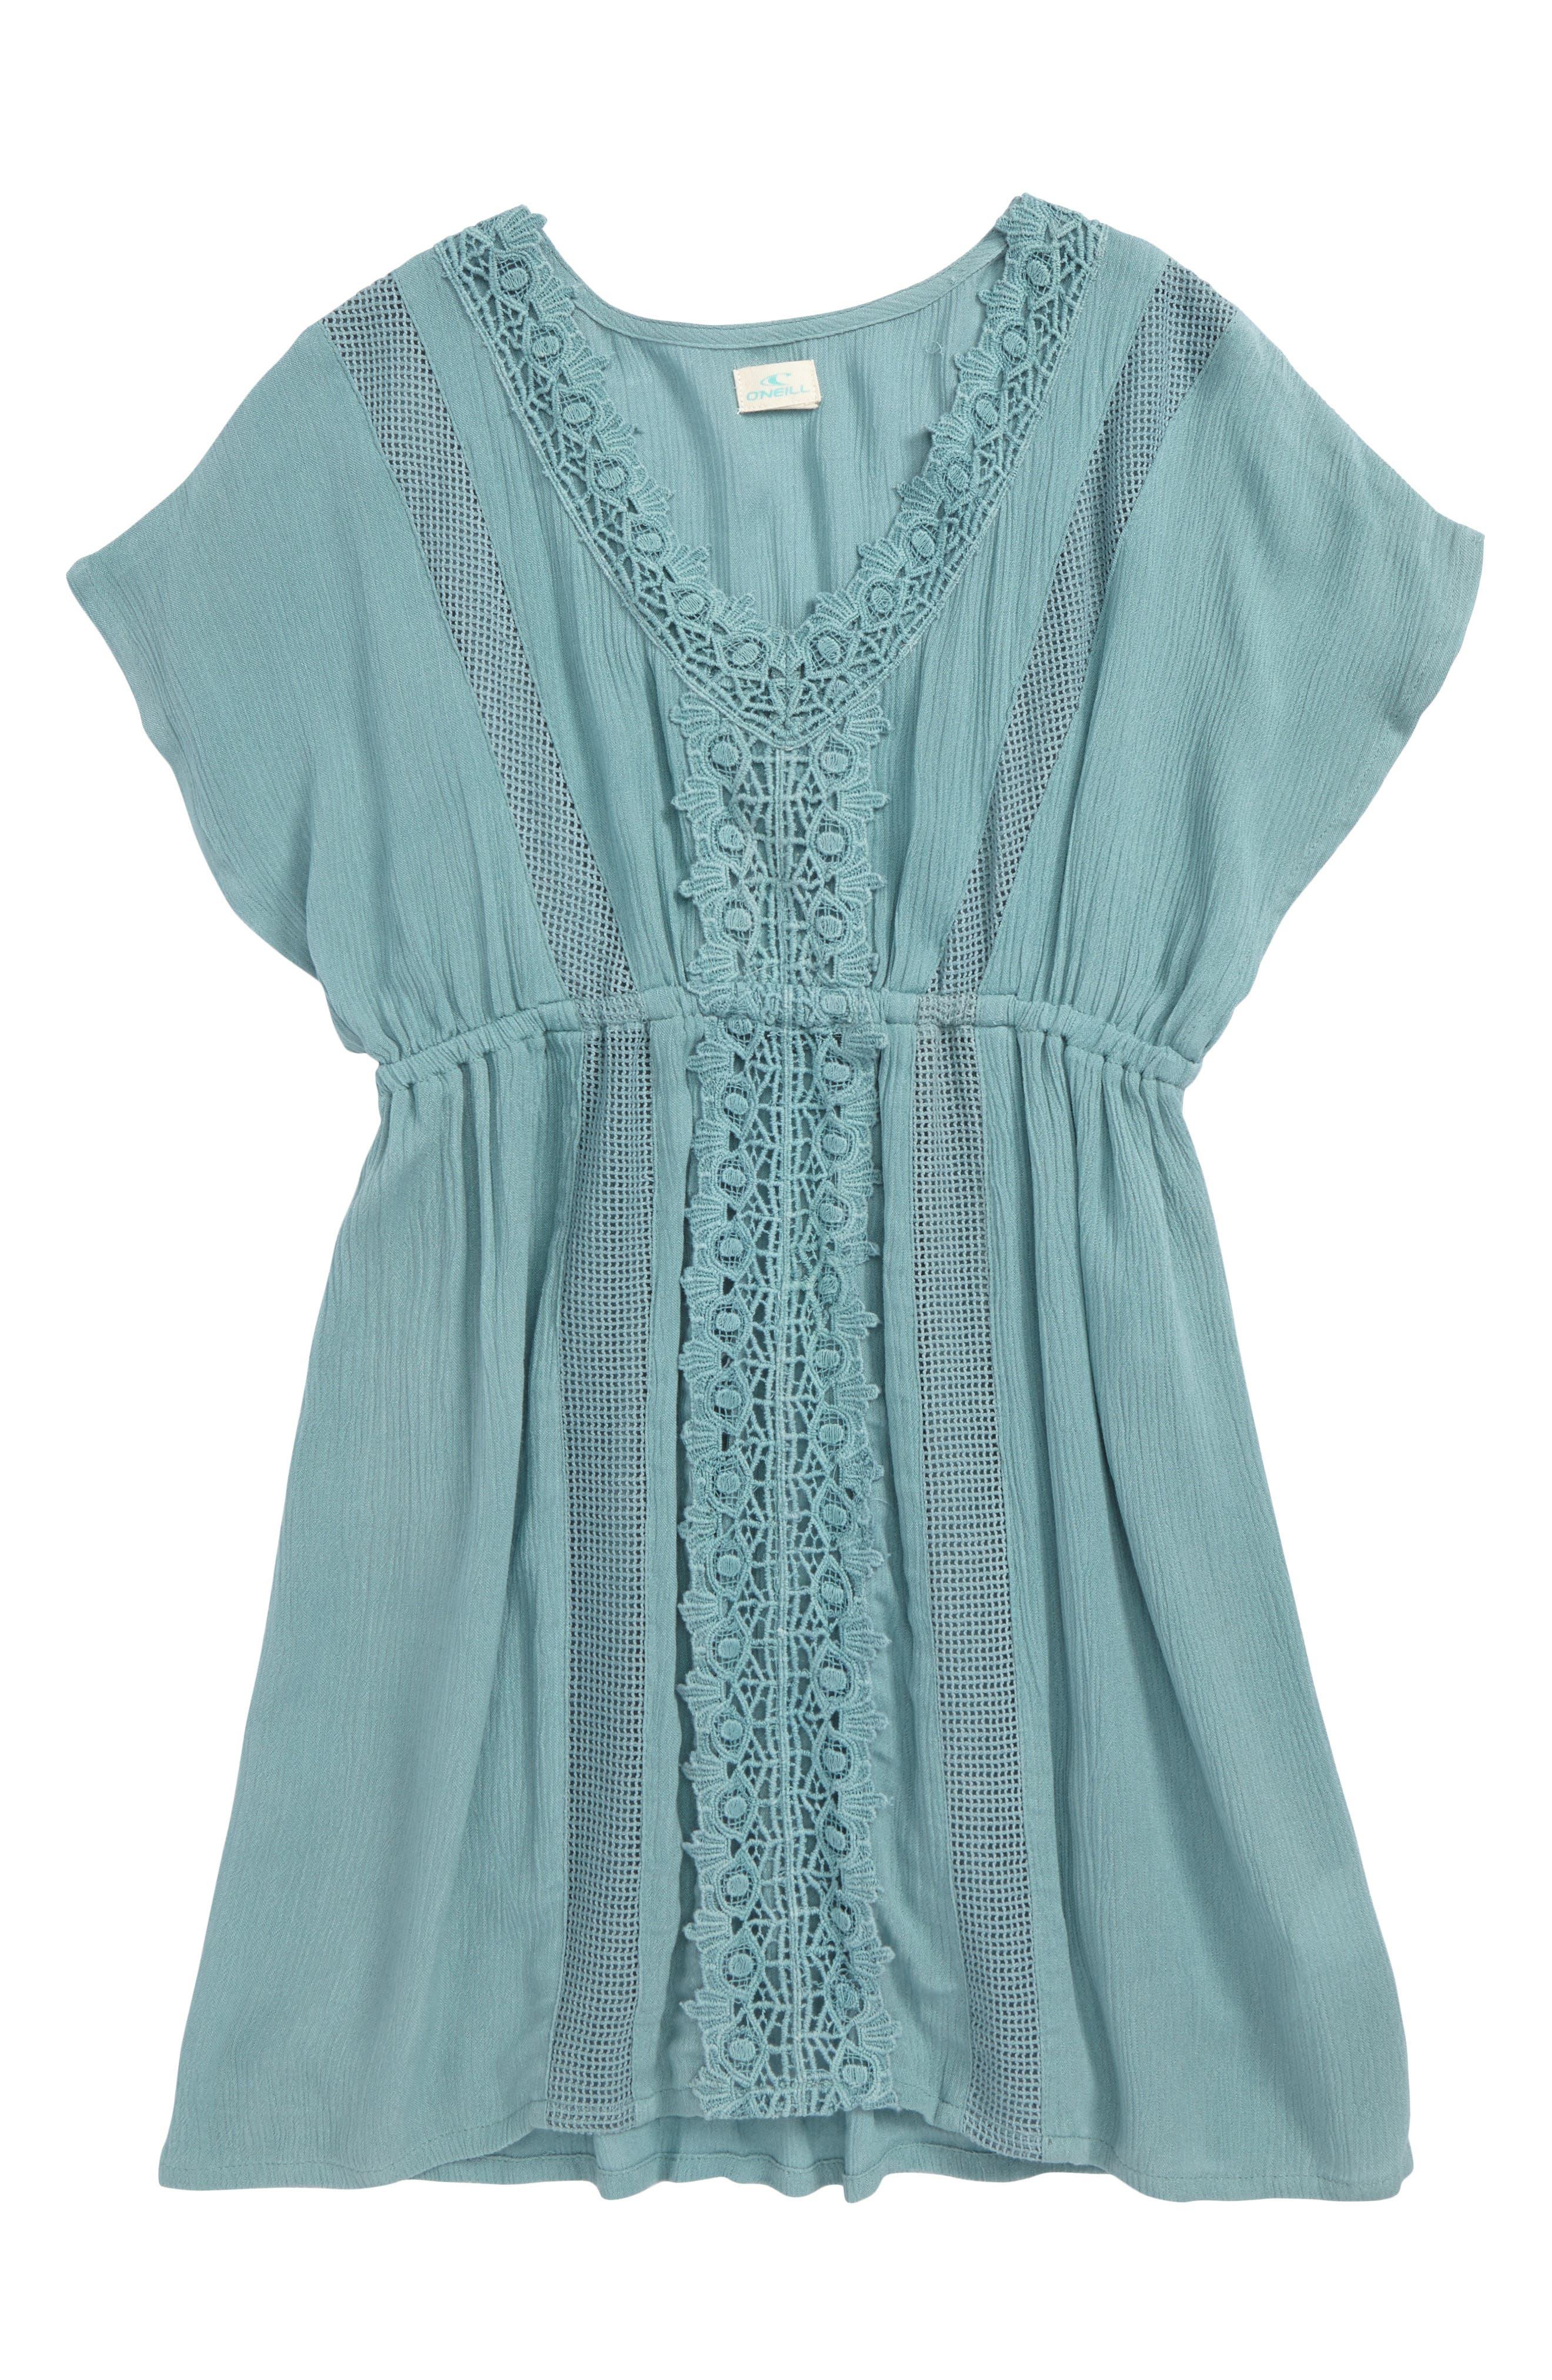 Alternate Image 1 Selected - O'Neill Kayla Crochet Cover-Up Dress (Big Girls)